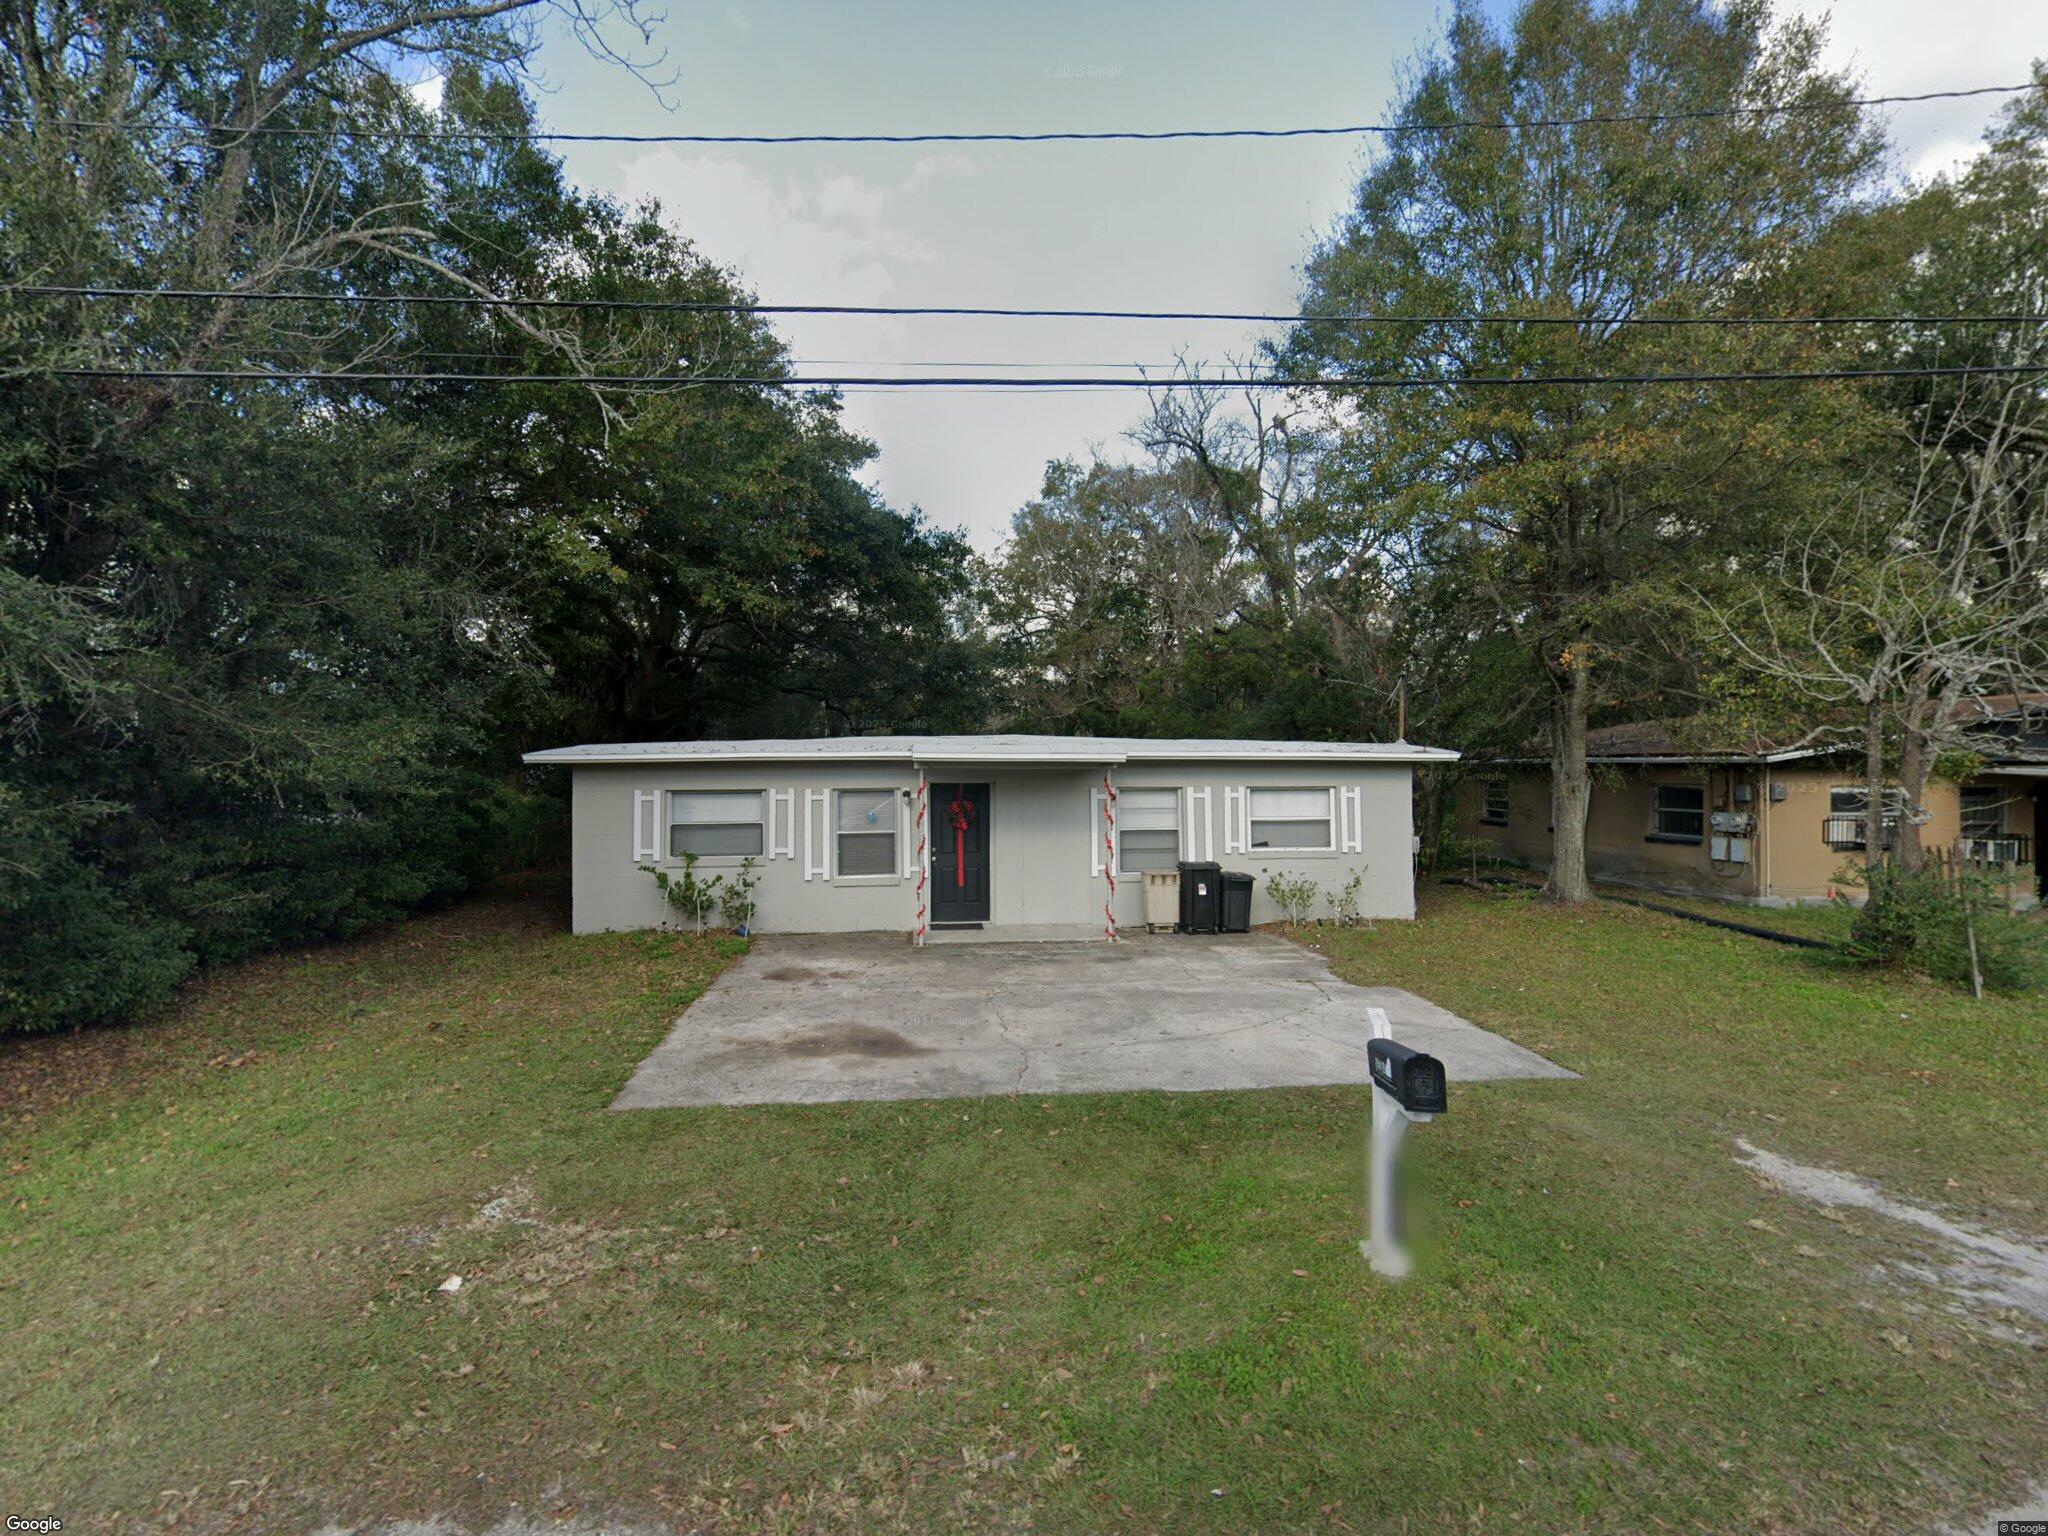 32254 Zip Code Map.2853 W 6th St Jacksonville Fl 32254 Foreclosure Trulia